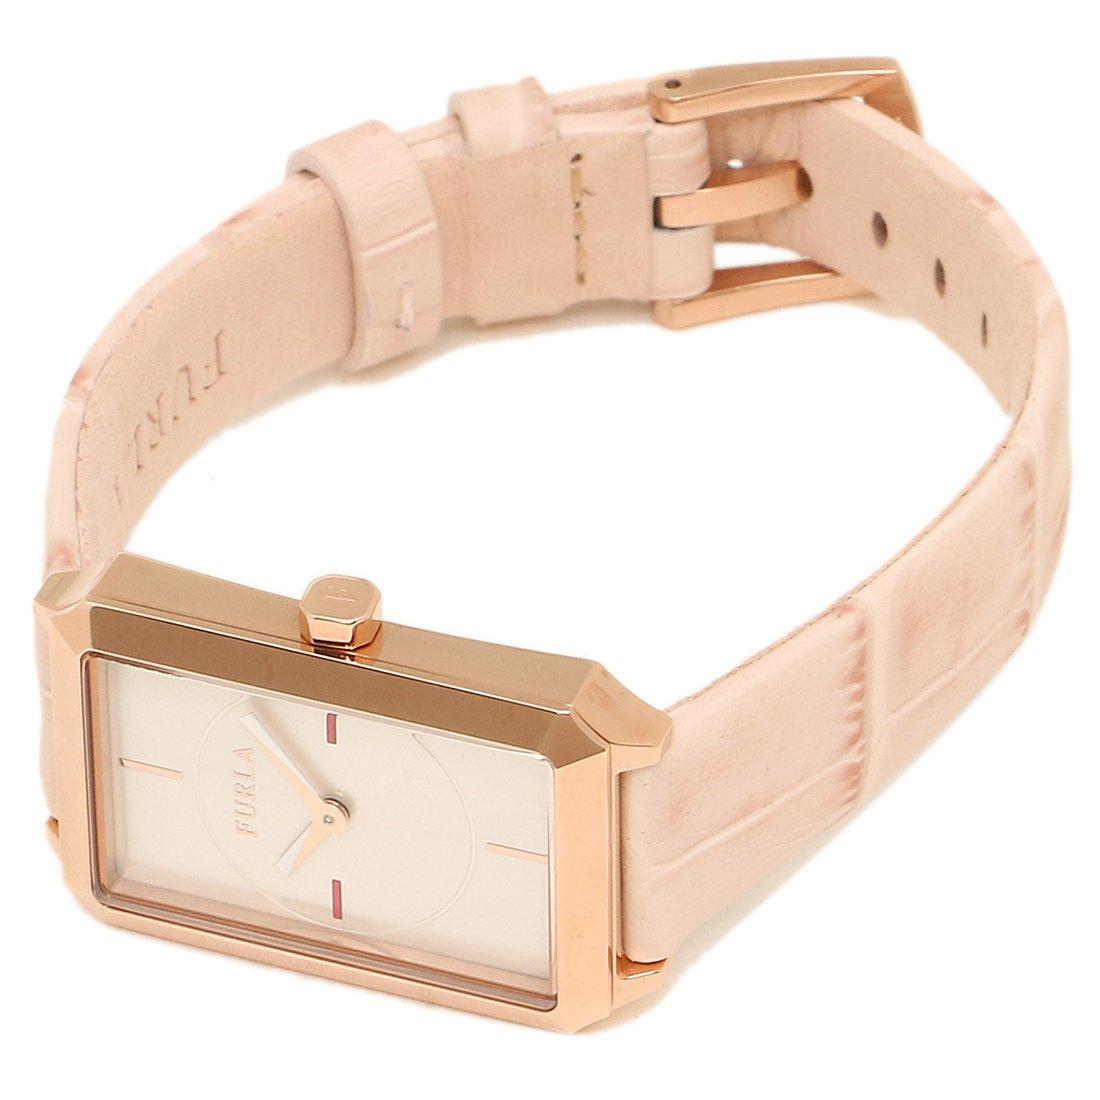 16294aff63a1 Amazon   [フルラ] 腕時計 レディース FURLA R4251104501 866575 ローズゴールド/ホワイト [並行輸入品]    並行輸入品・逆輸入品・中古品(レディース)   腕時計 通販